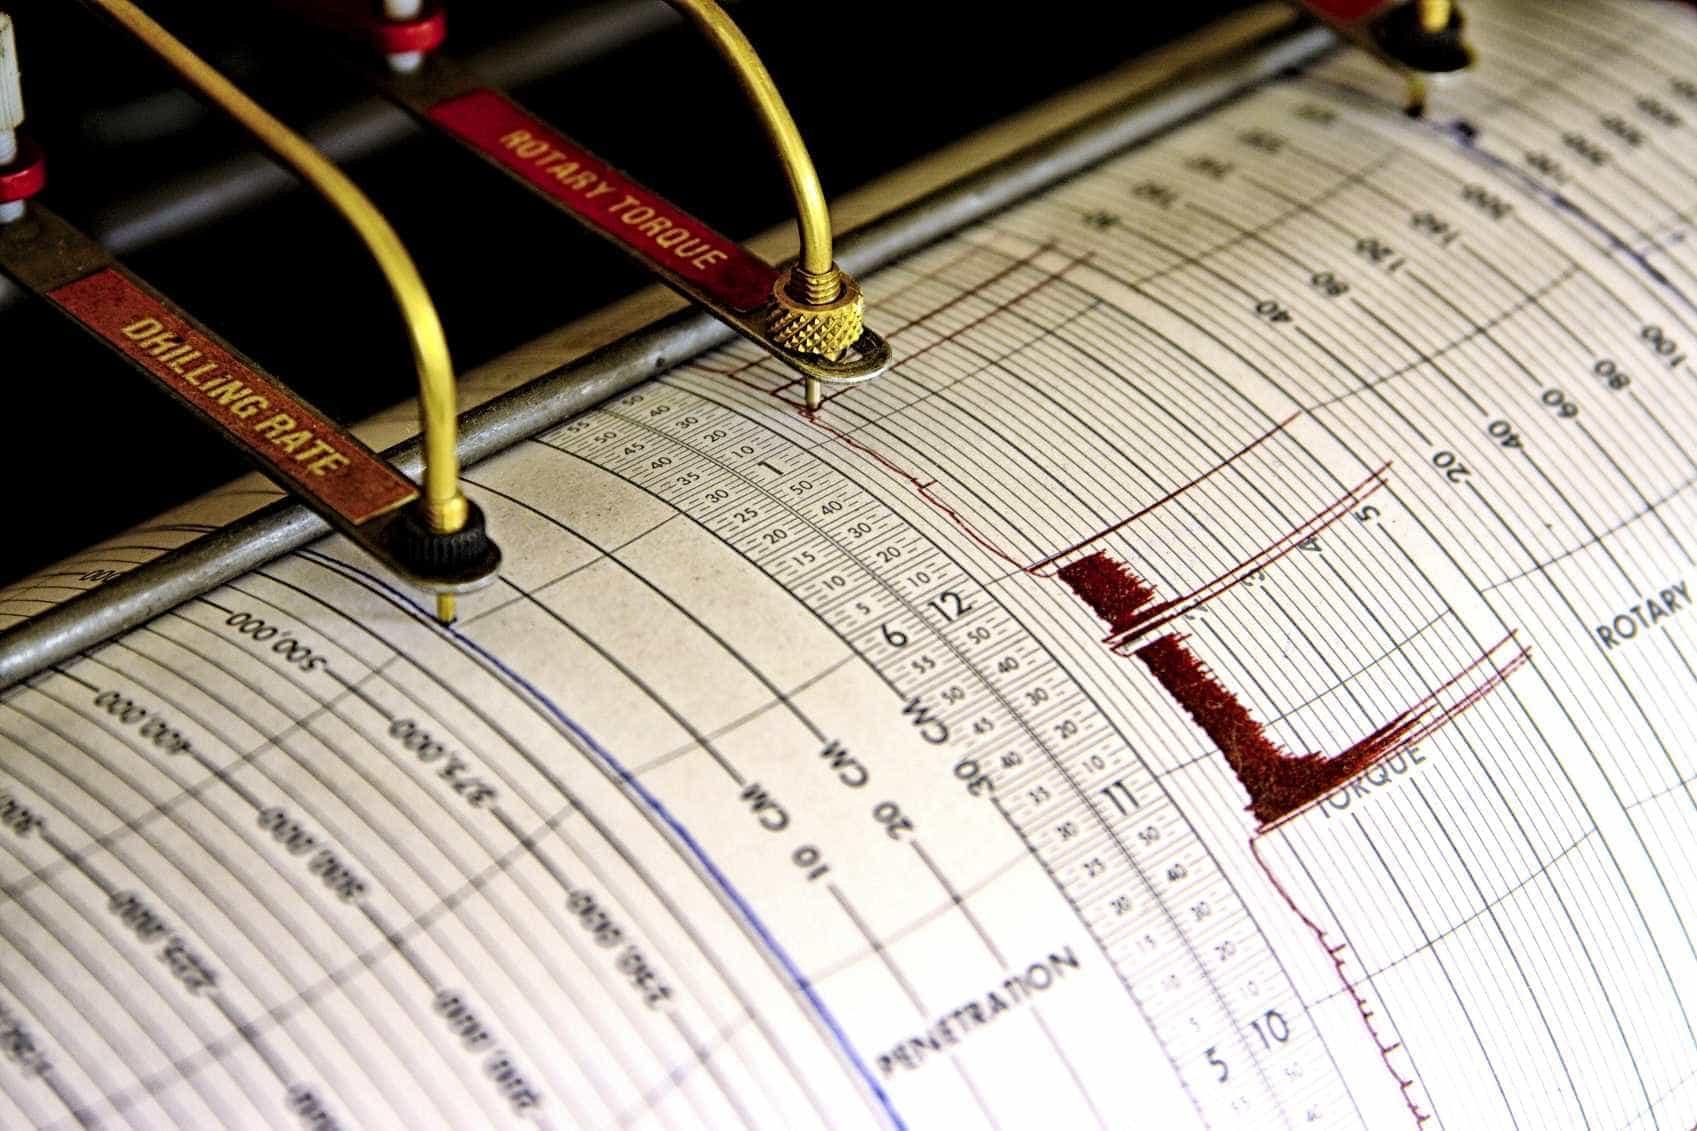 Sismo de magnitude 5.2 registado a 480 km a oeste de Peniche